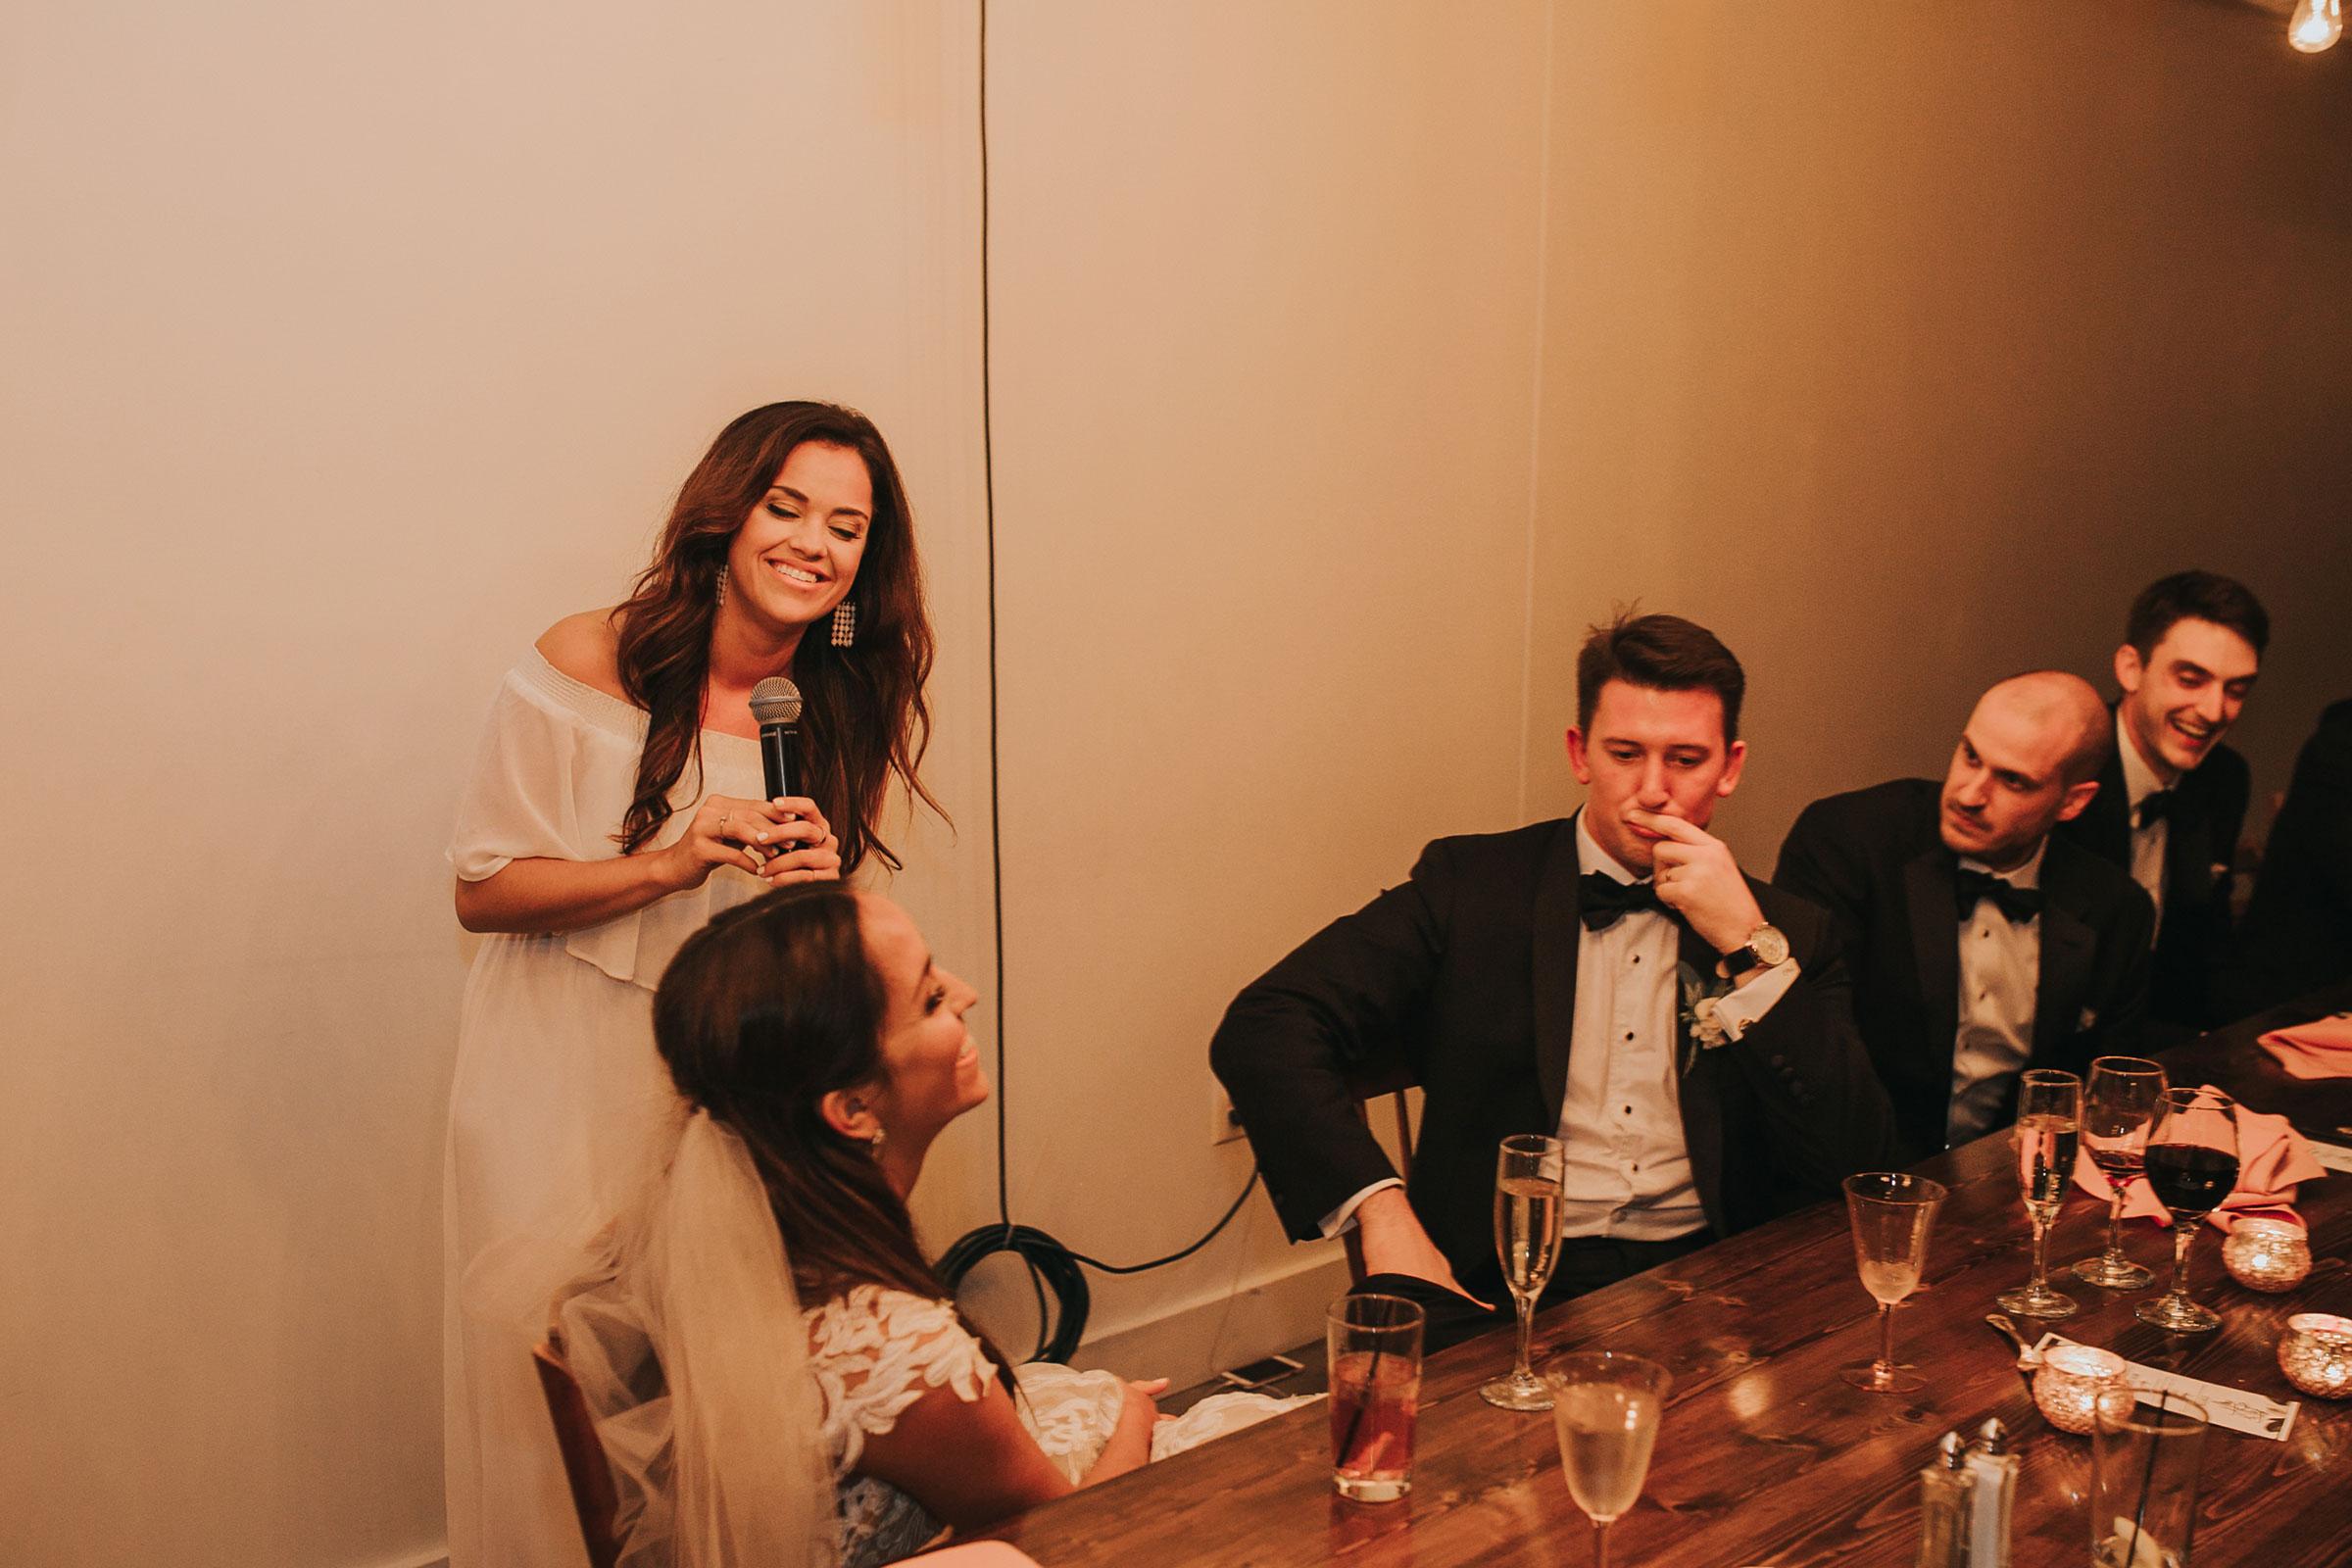 bride-groom-laughing-at-maid-of-honor-speech-omaha-nebraska-raelyn-ramey-photography.jpg